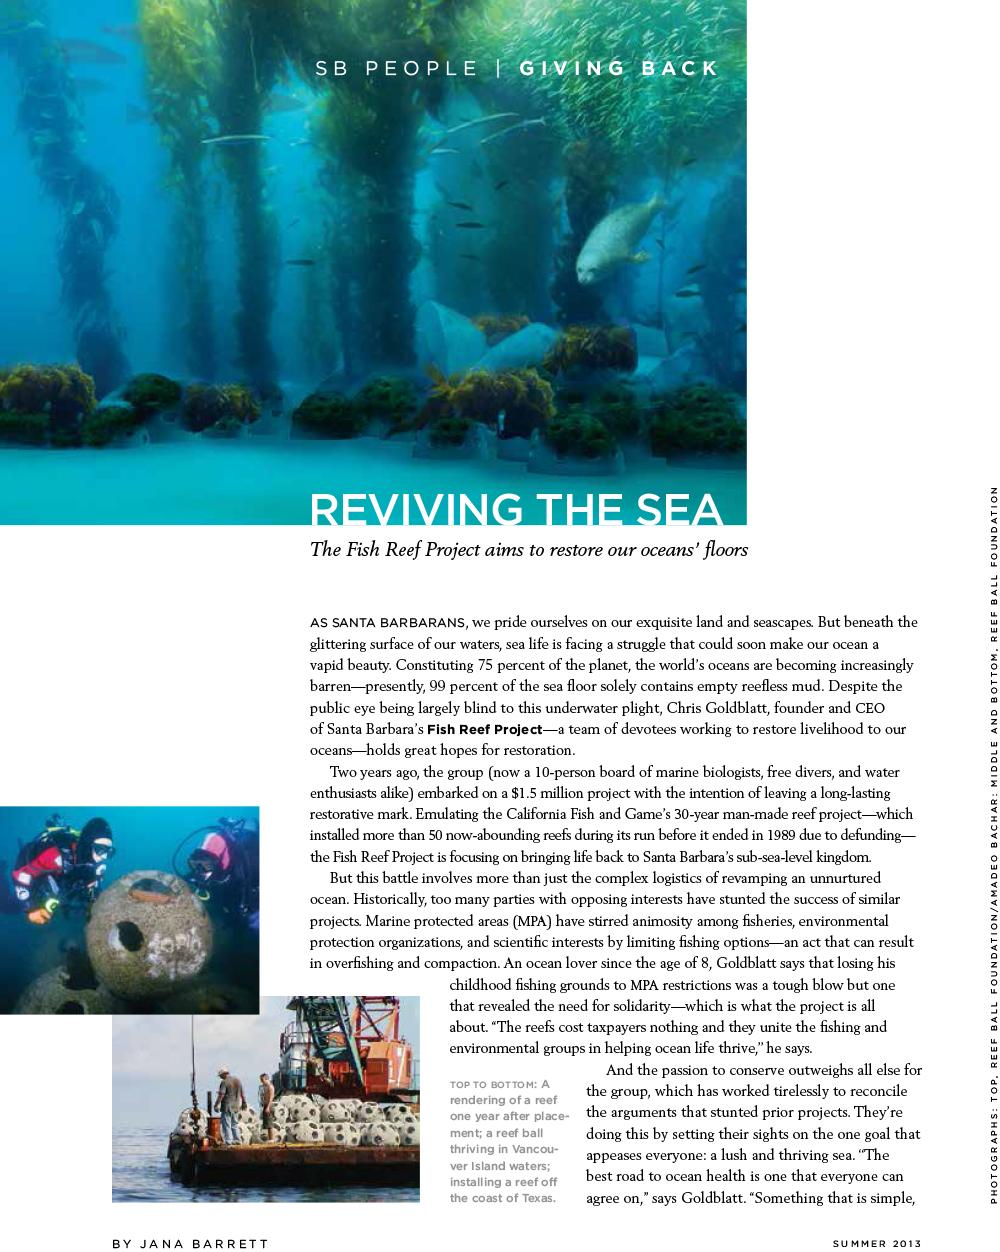 SB_magazine cover